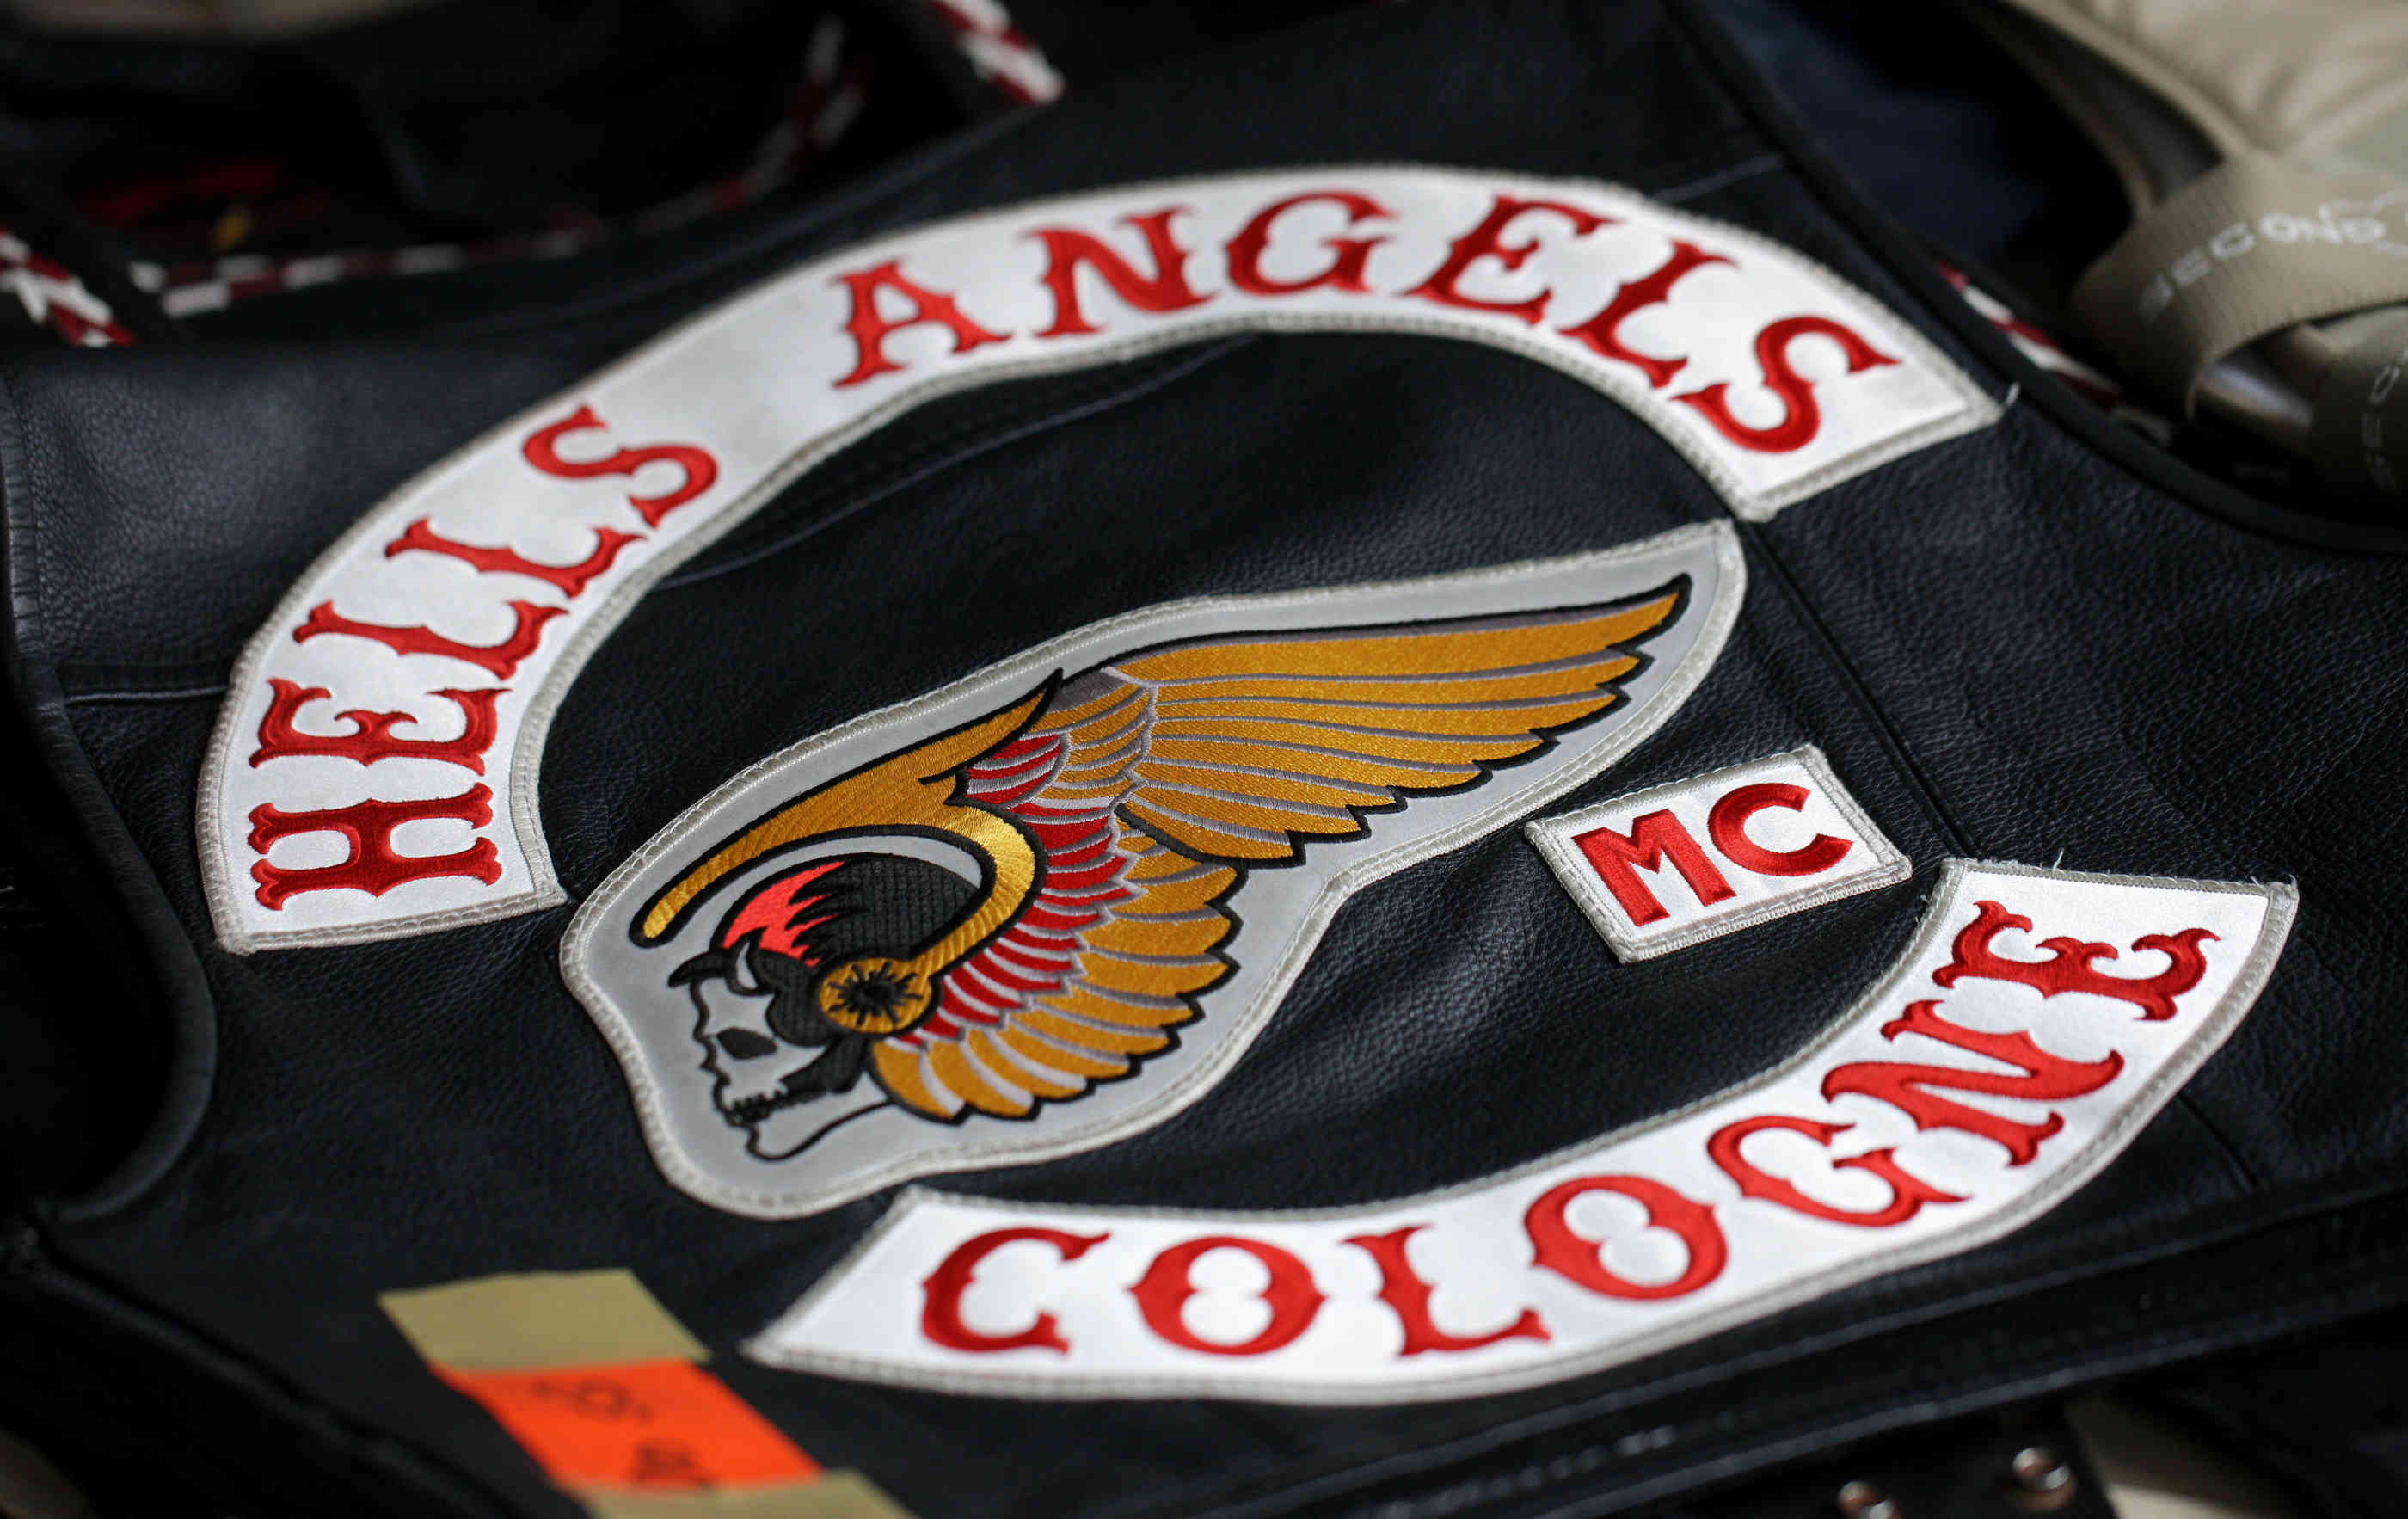 Hells Angels Köln